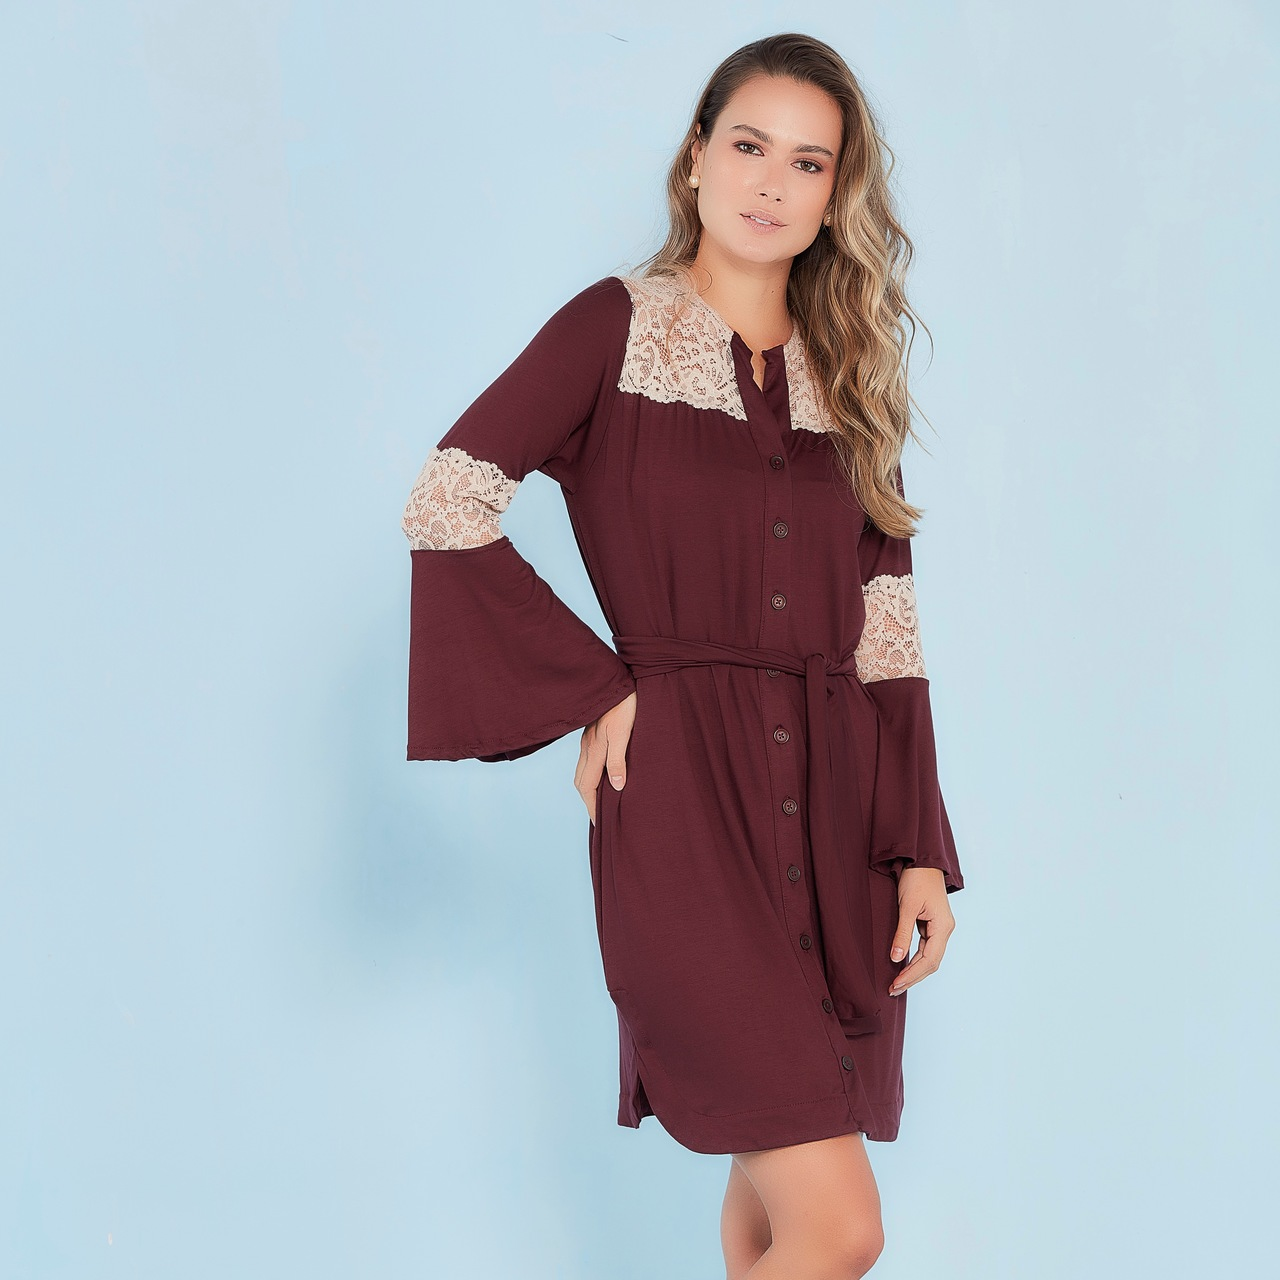 Camisola chemise viscolycra e renda vinho